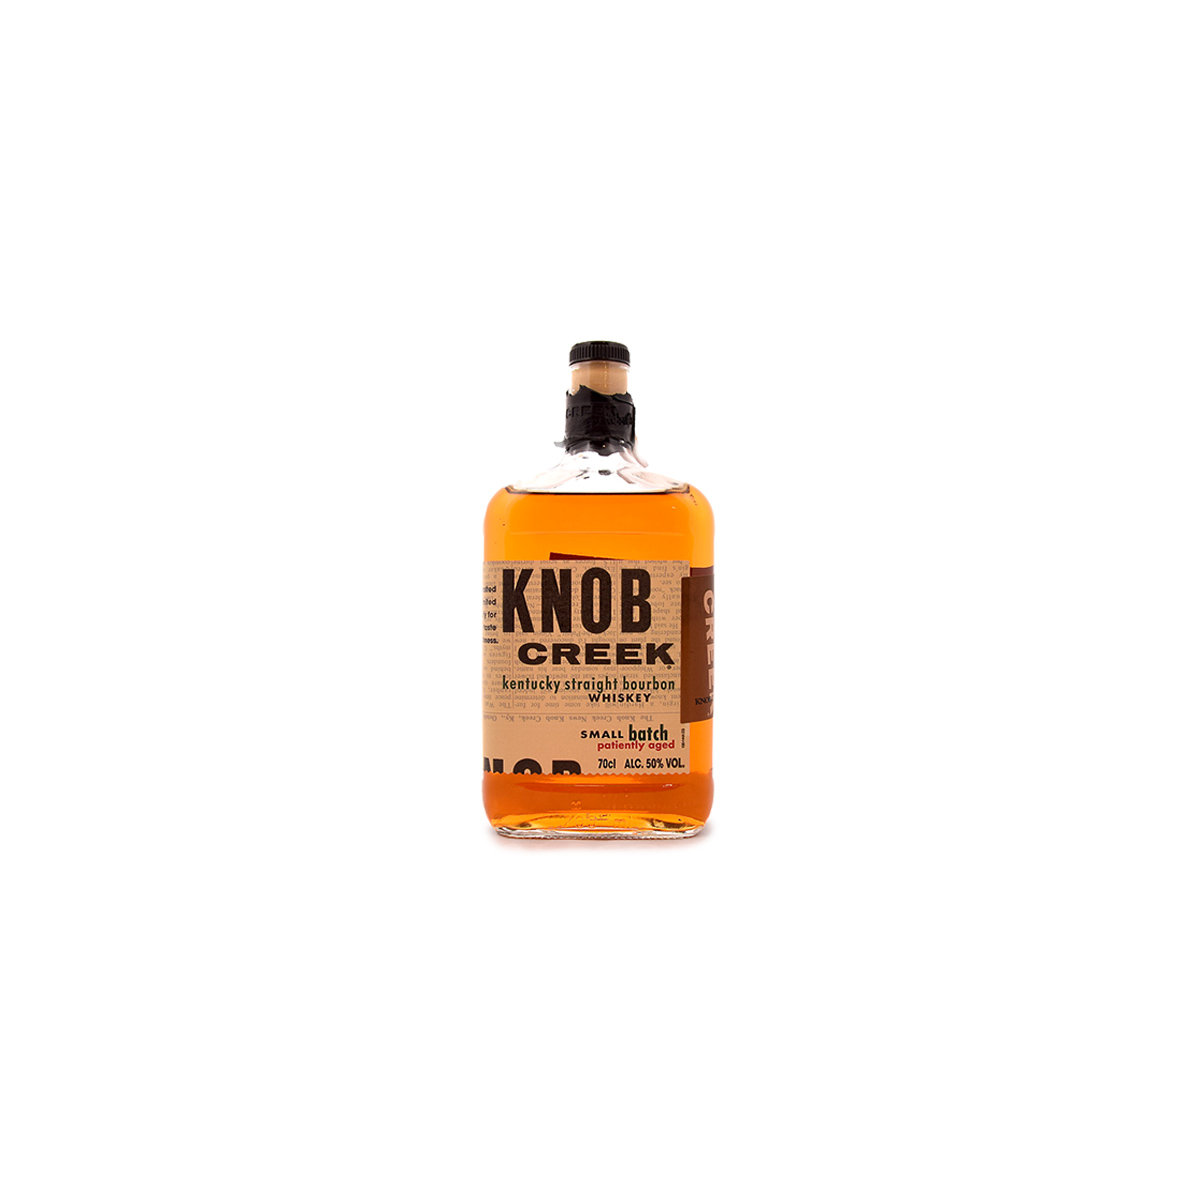 Knob Creek Small Batch (50%) - 30 ml.